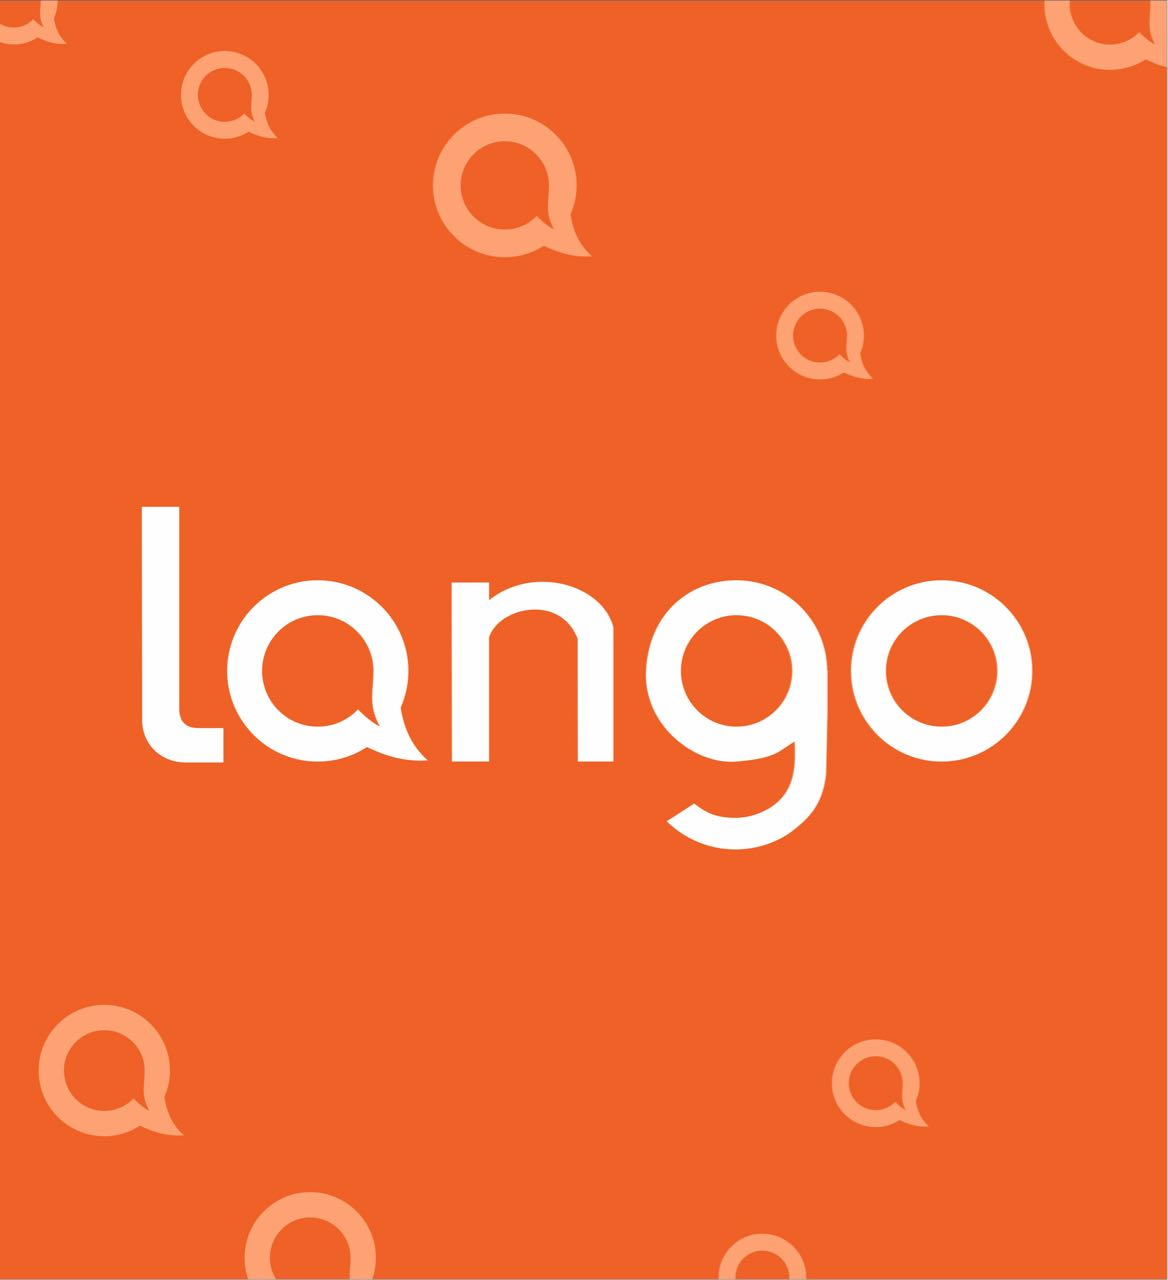 LANGO - курсы английского языка в Атырау